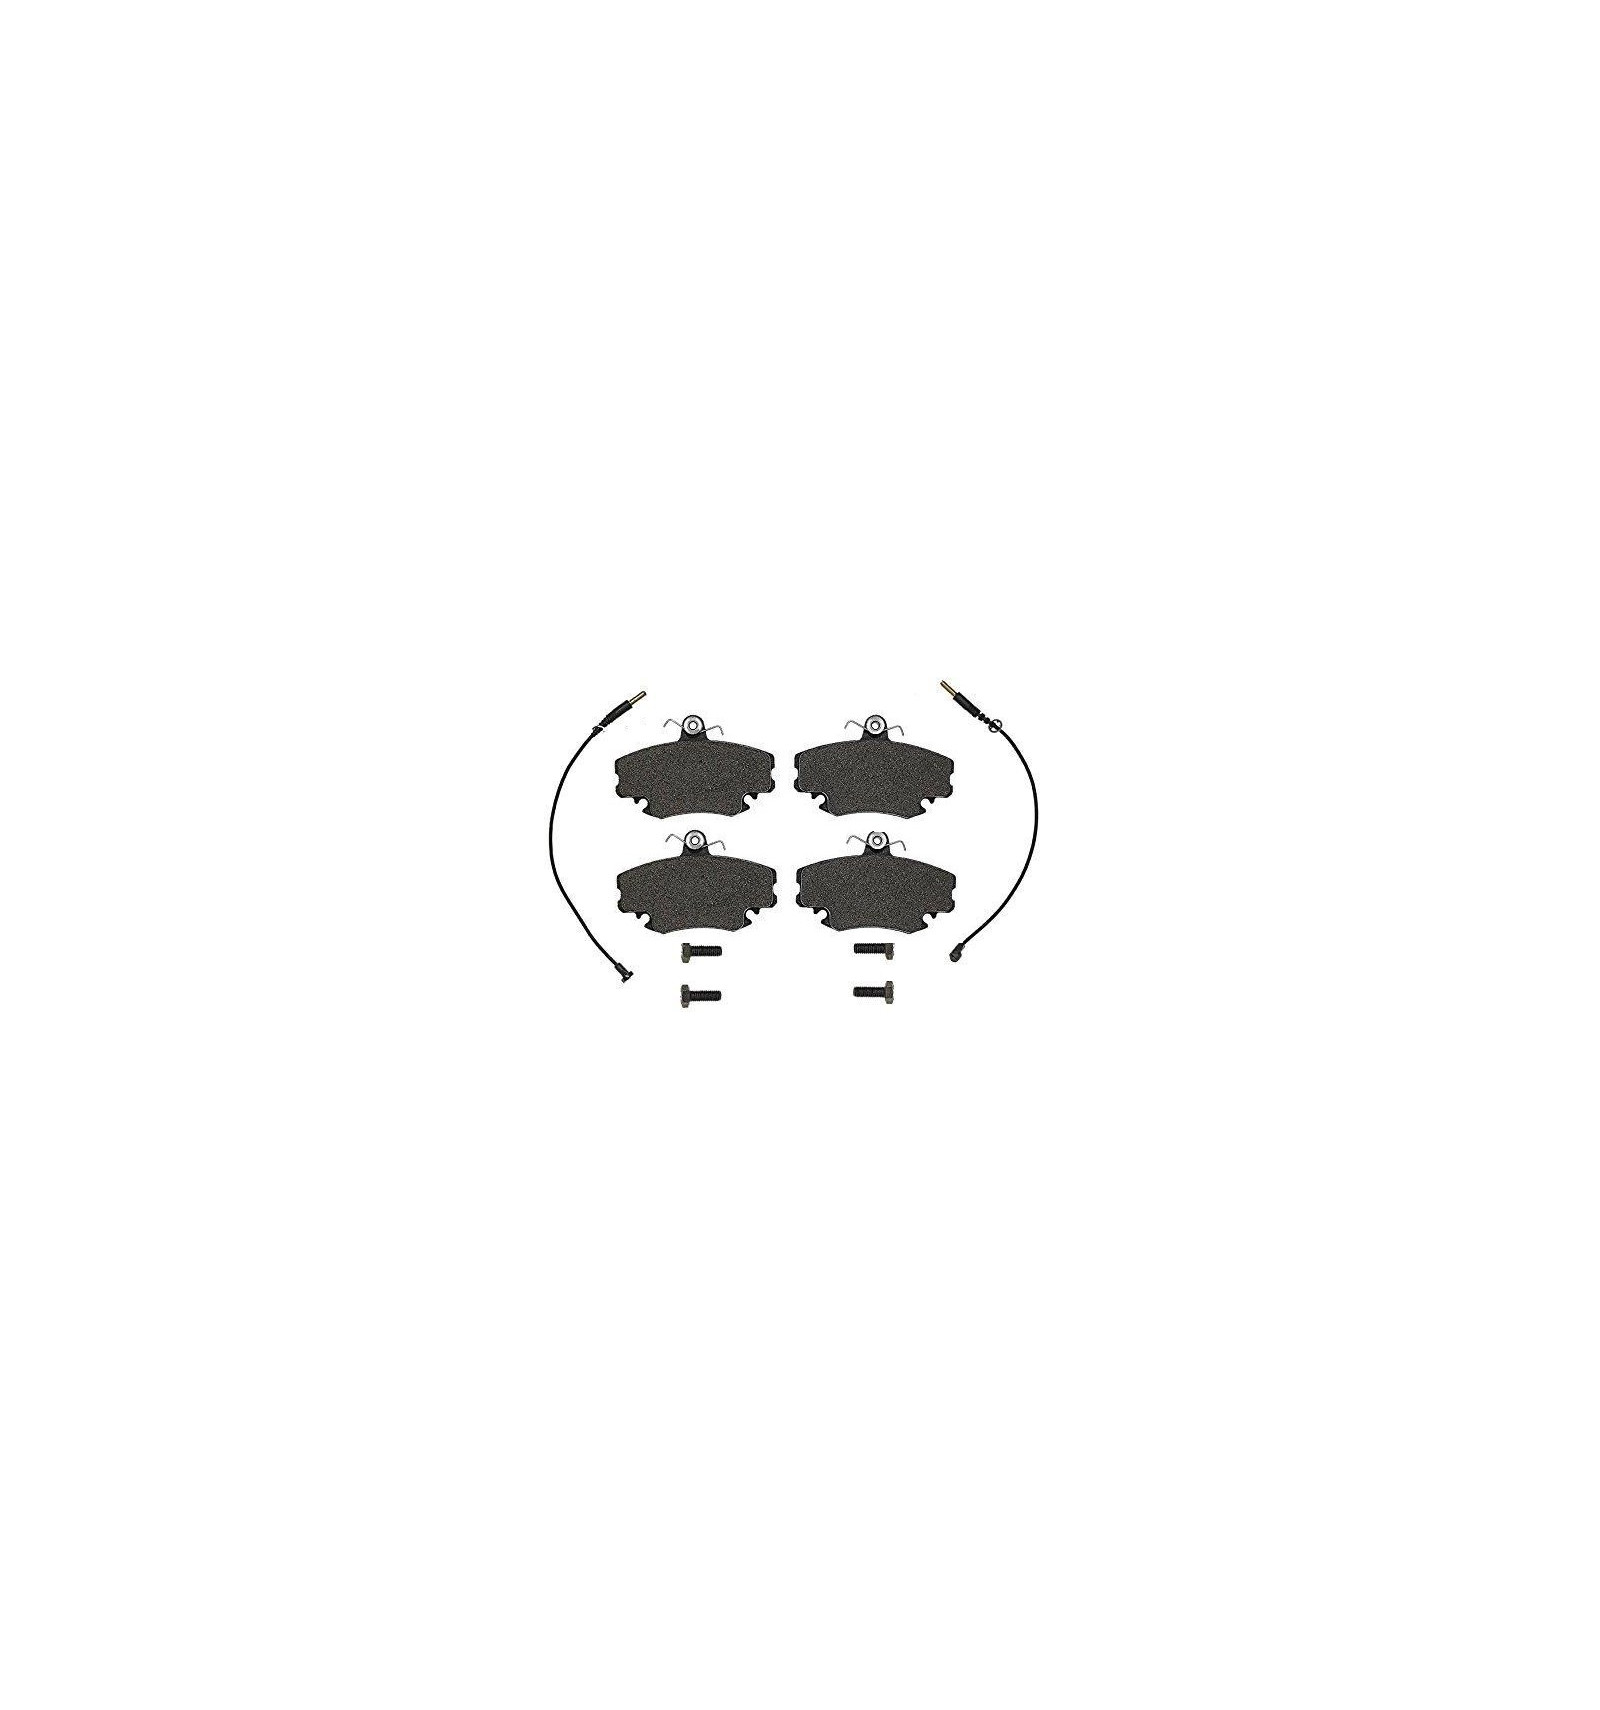 plaquettes de frein avant renault clio twingo r19 kangoo. Black Bedroom Furniture Sets. Home Design Ideas